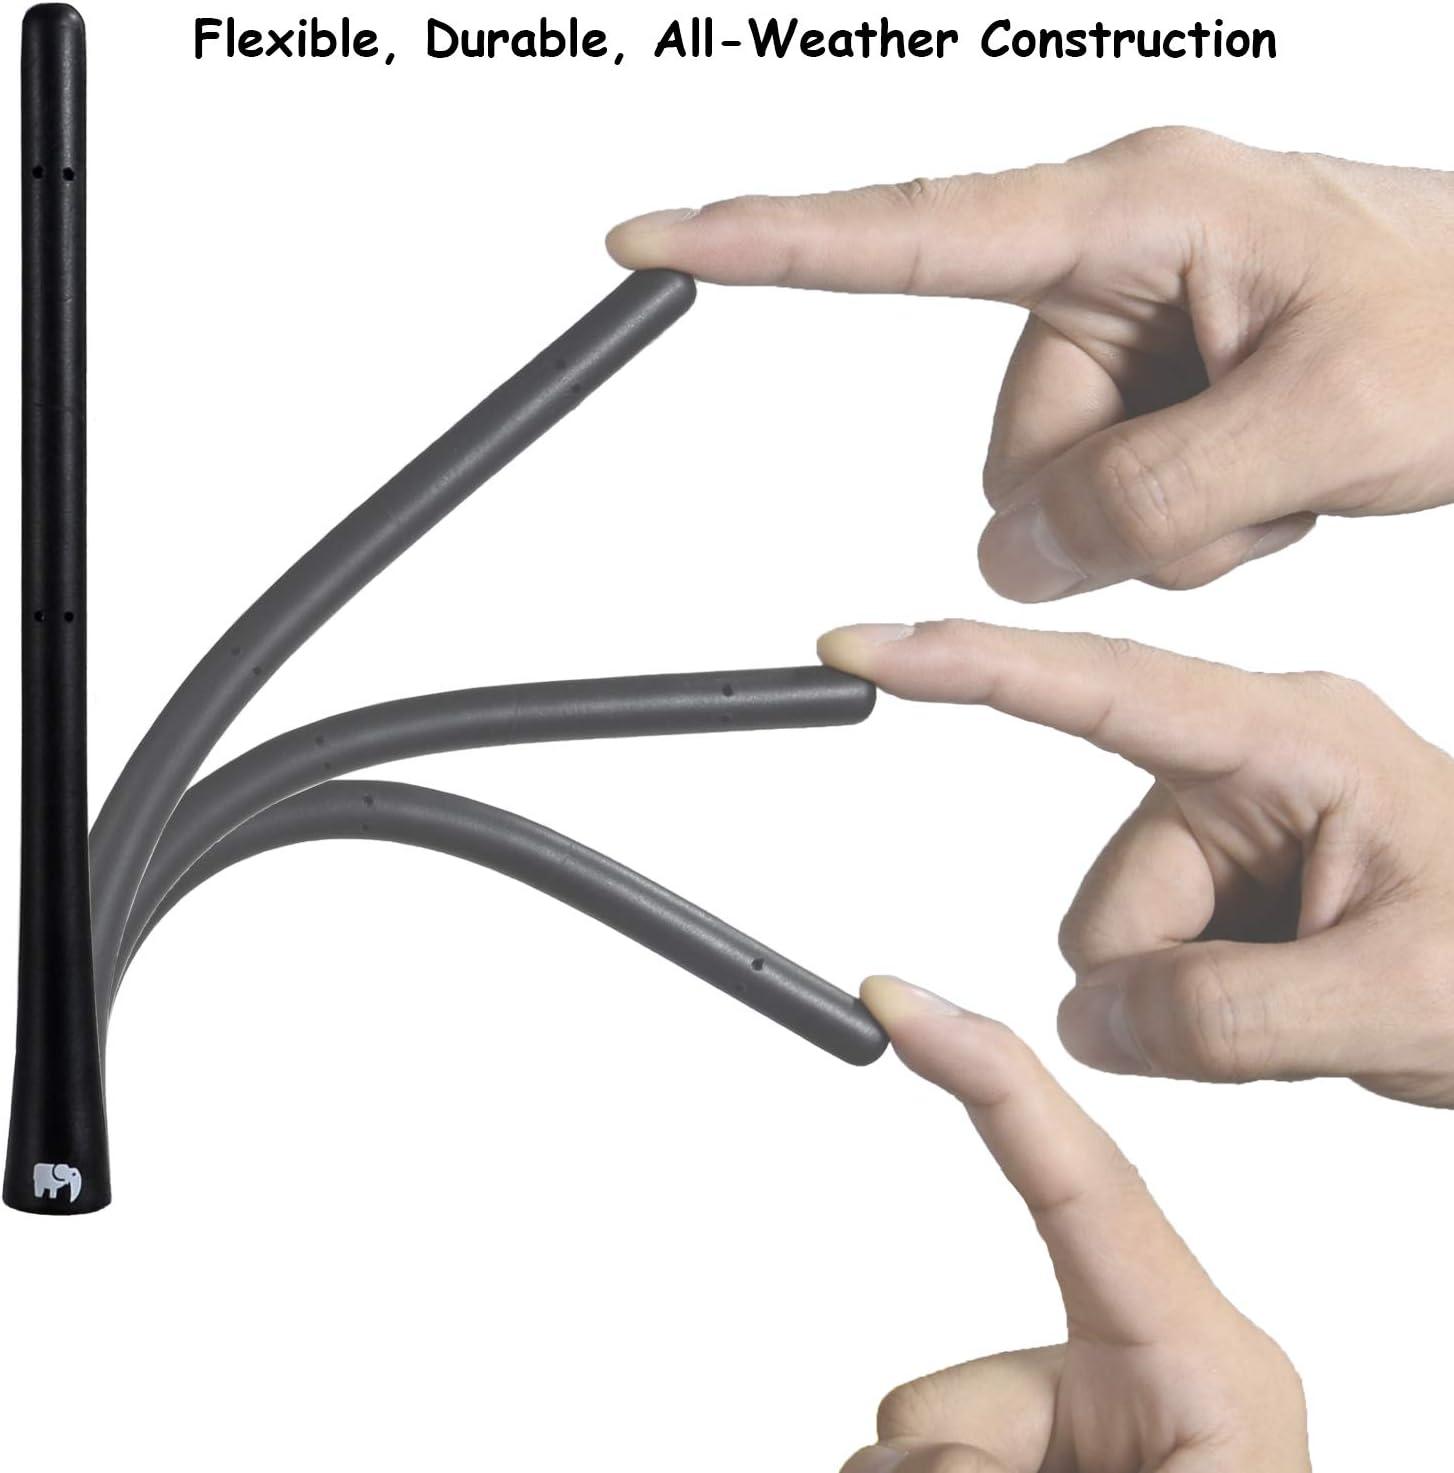 - Designed for Optimized FM//AM Reception 2007-2019 ONE250 7 inch Flexible Rubber Antenna for Chevy 2003-2020 Equinox Avalanche 2002-2013 White Silverado Colorado 2003-2017